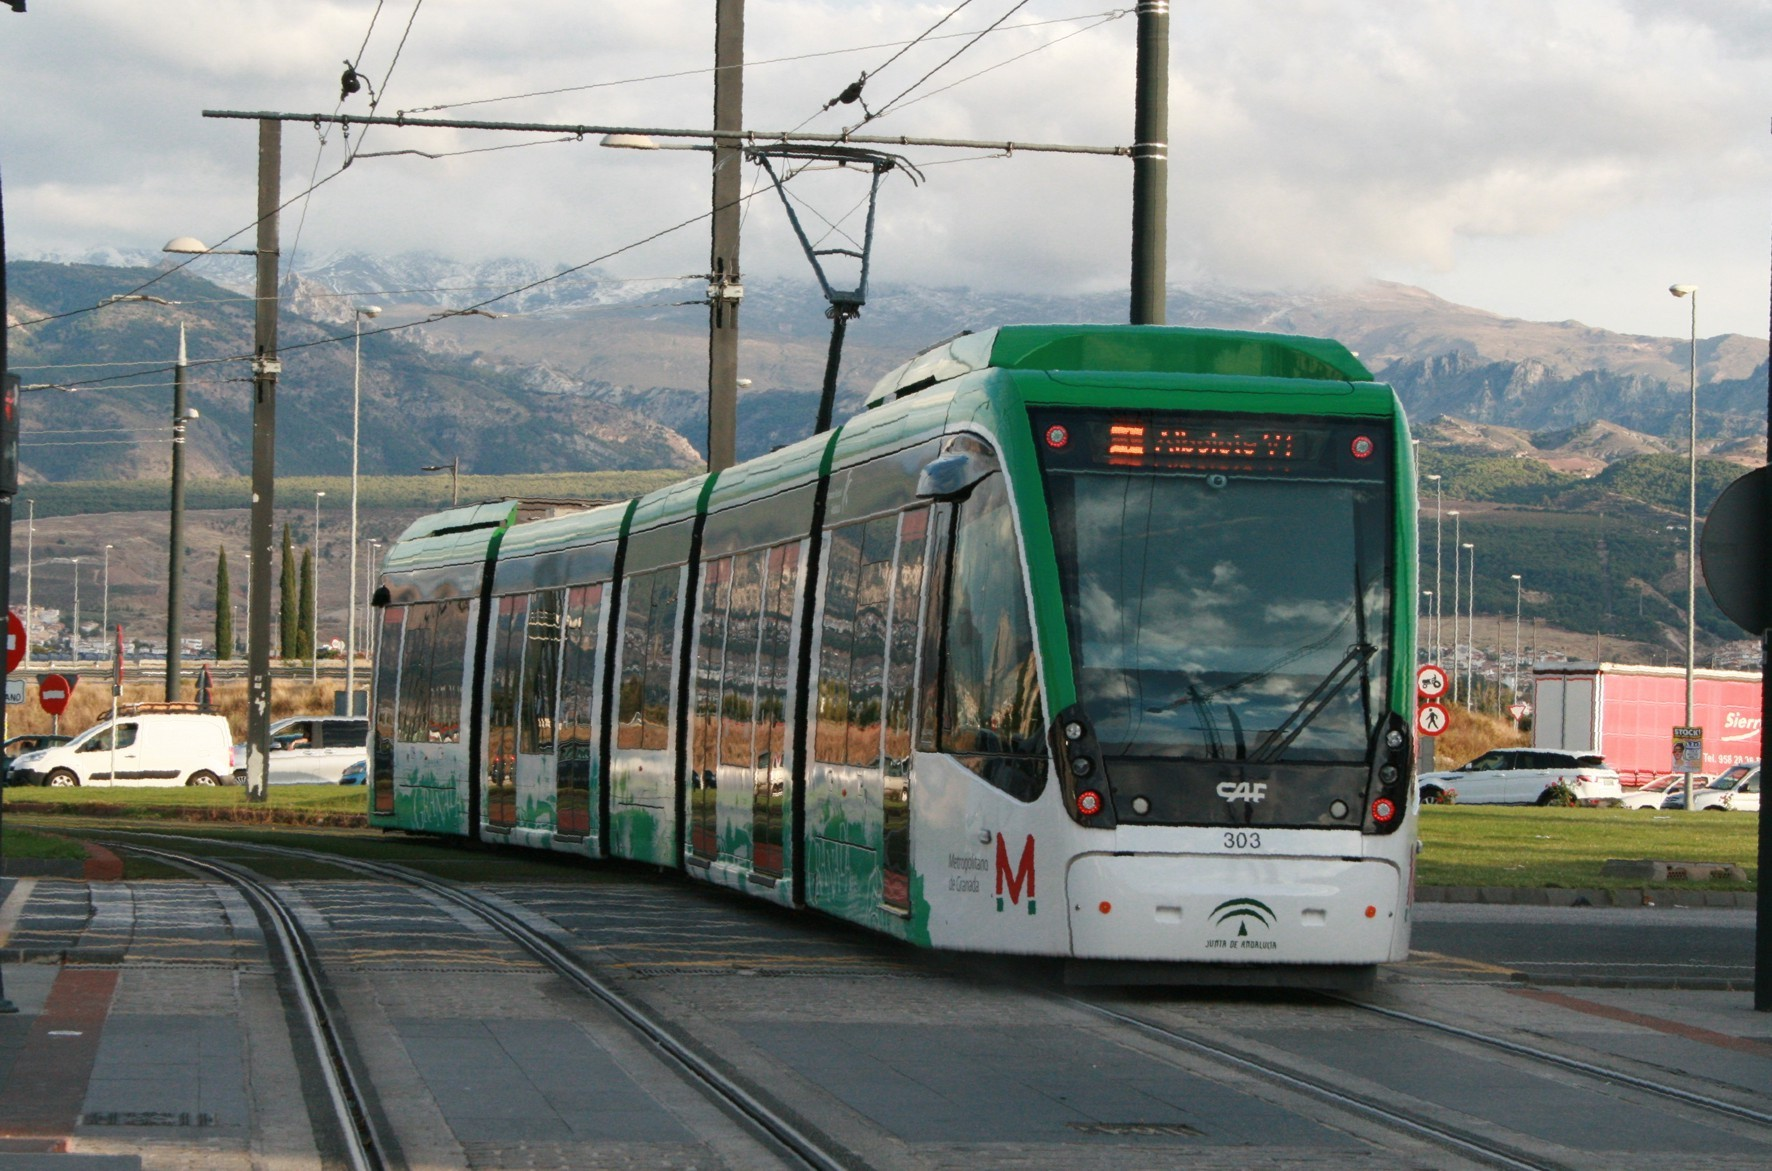 Metro de Granada transportó a 5,9 millones de vajeros durante 2020 a pesar de la pandemia